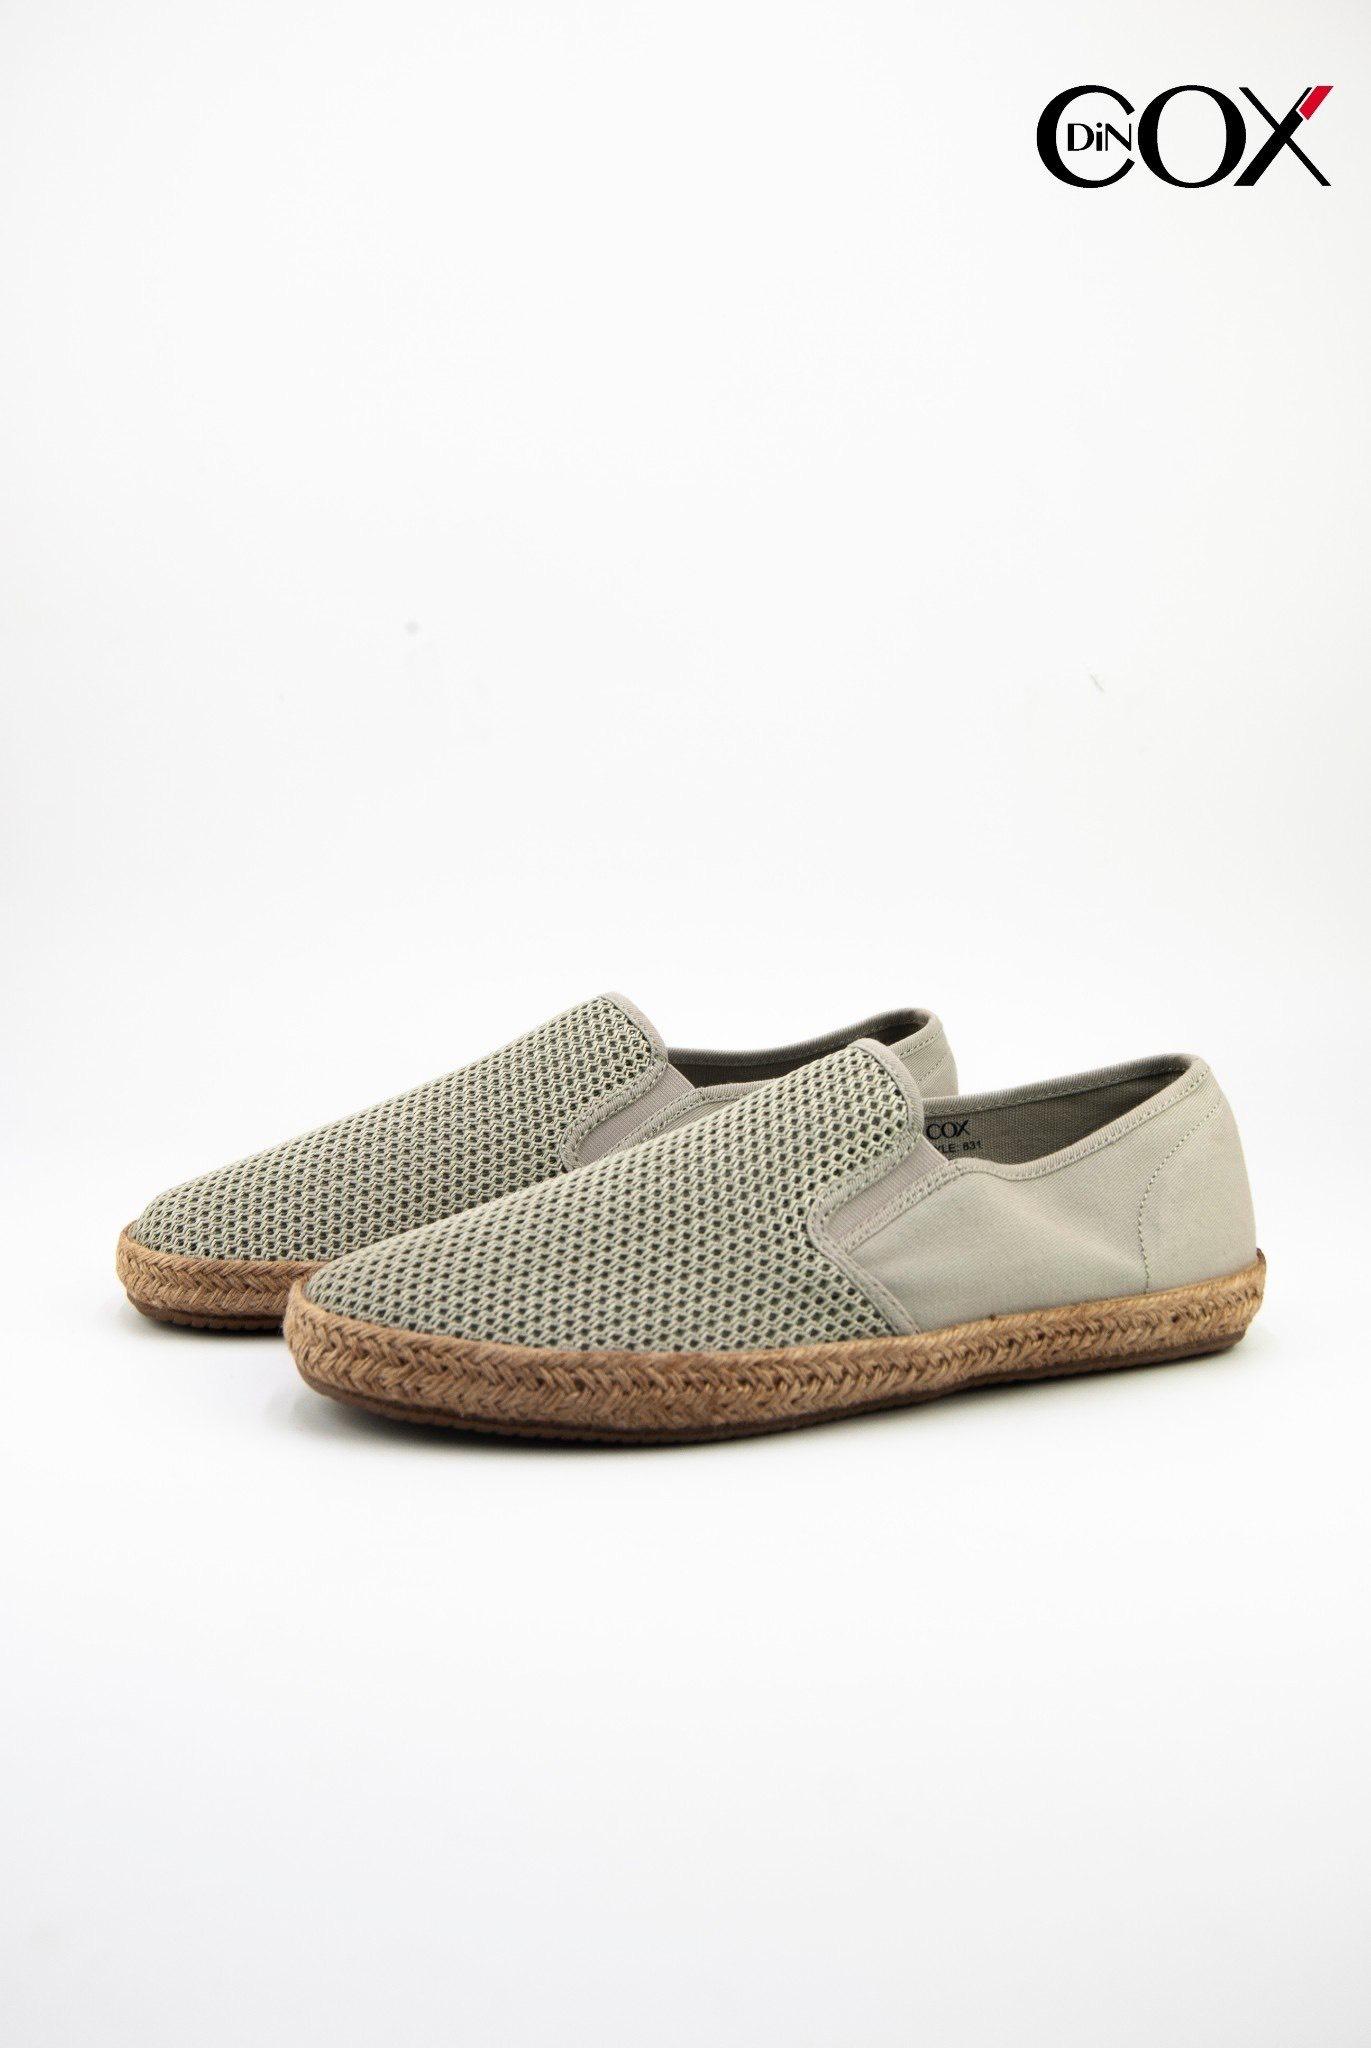 dincox831-grey